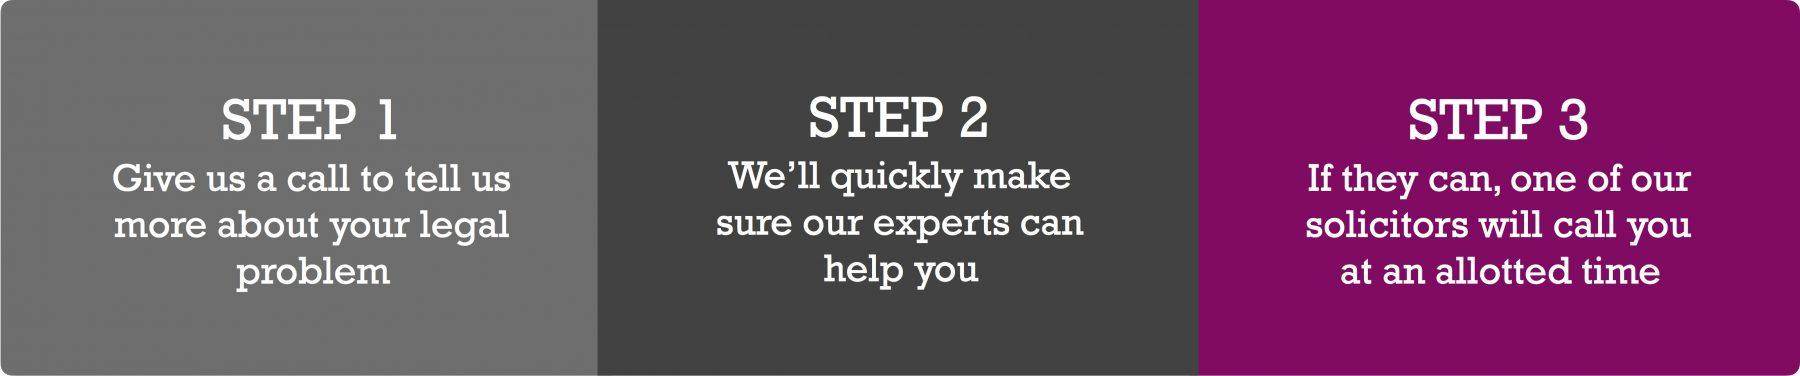 Simple legal advice